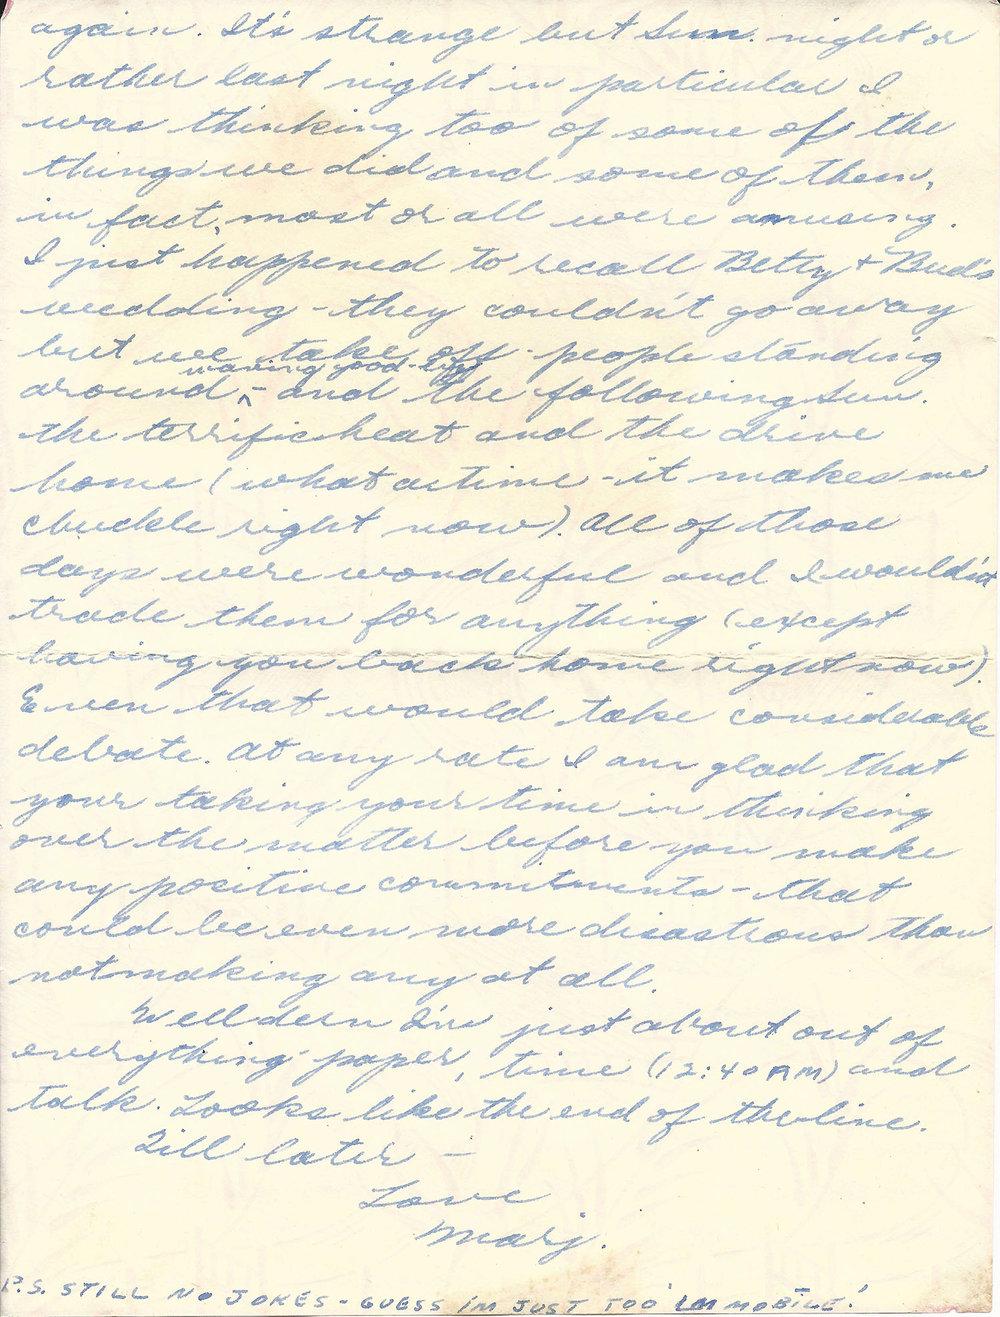 Feb. 24, 1953 (Marj), Page 4